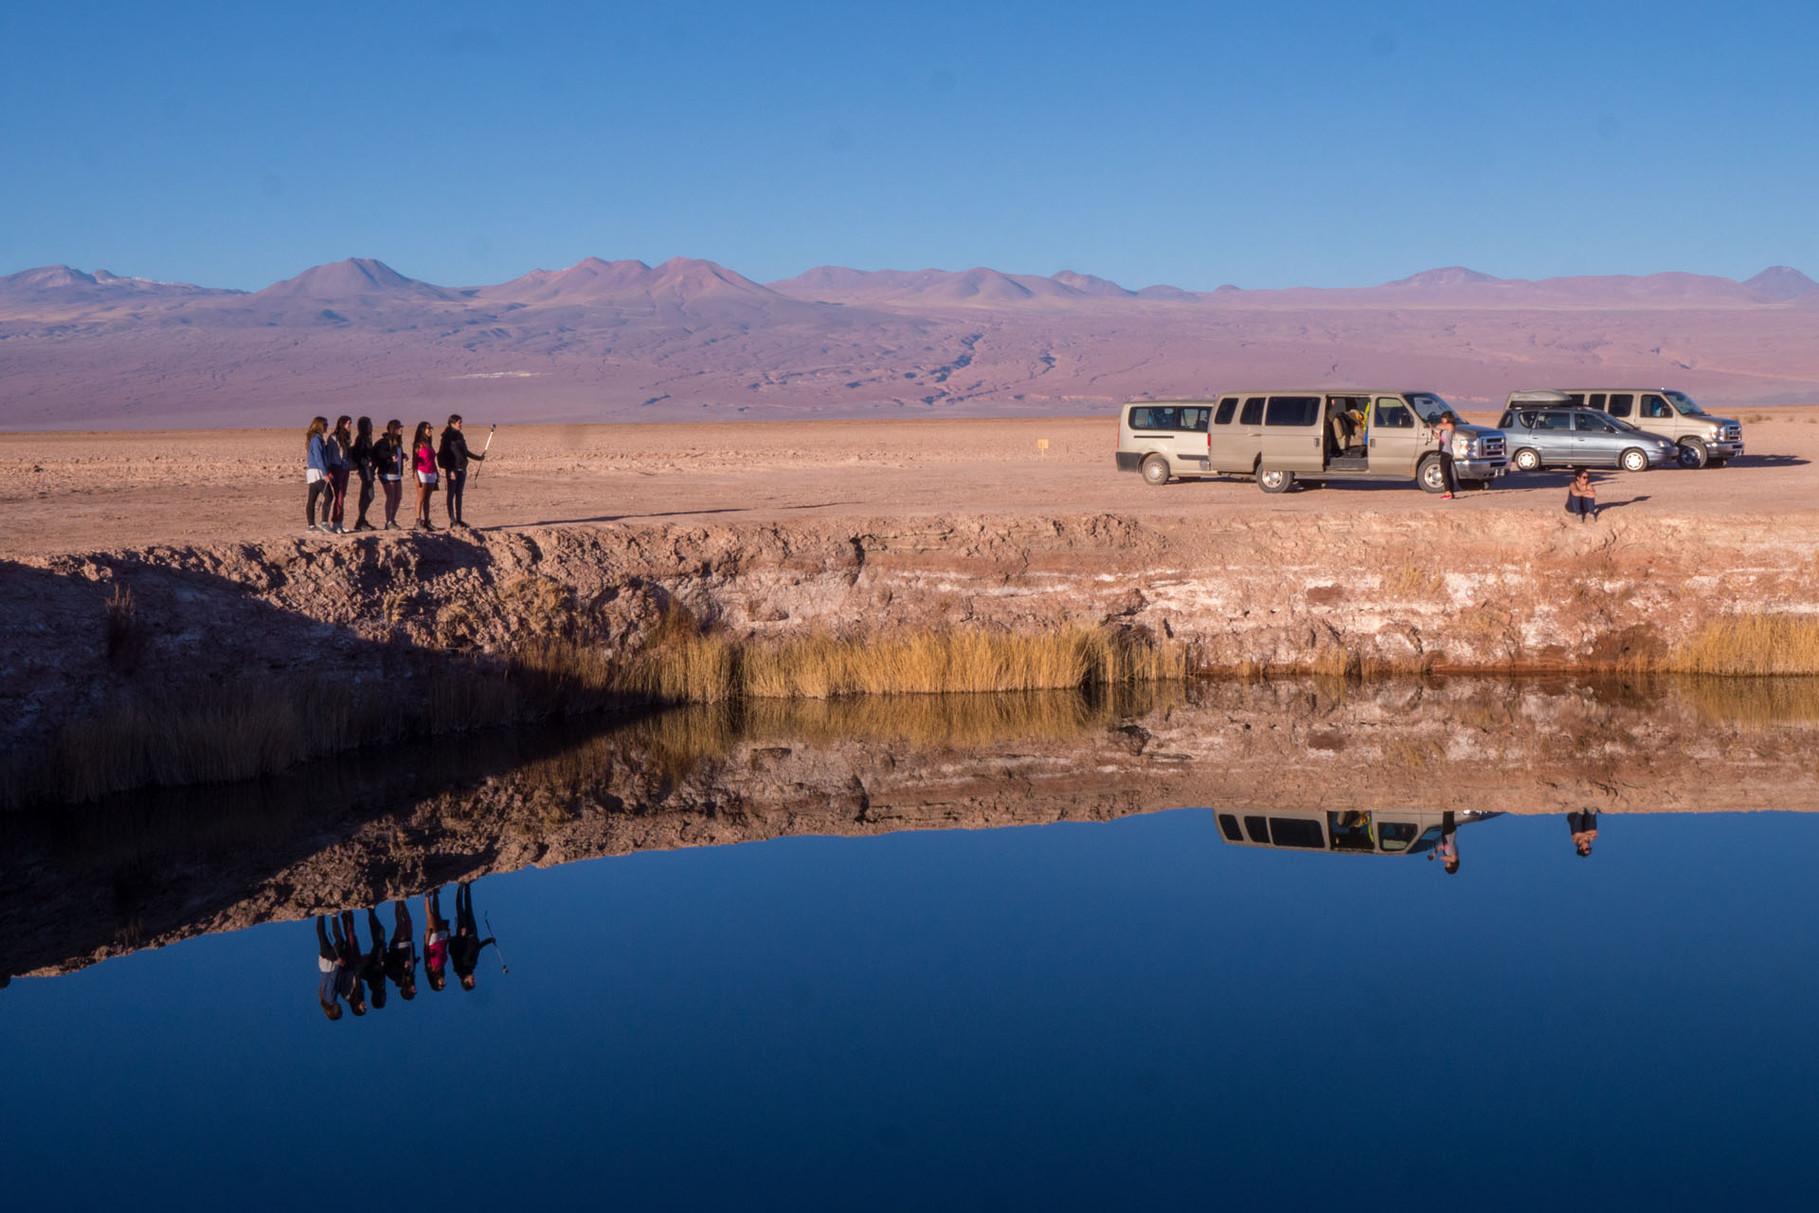 Ojos del Salar, near San Pedro de Atacama, Chile